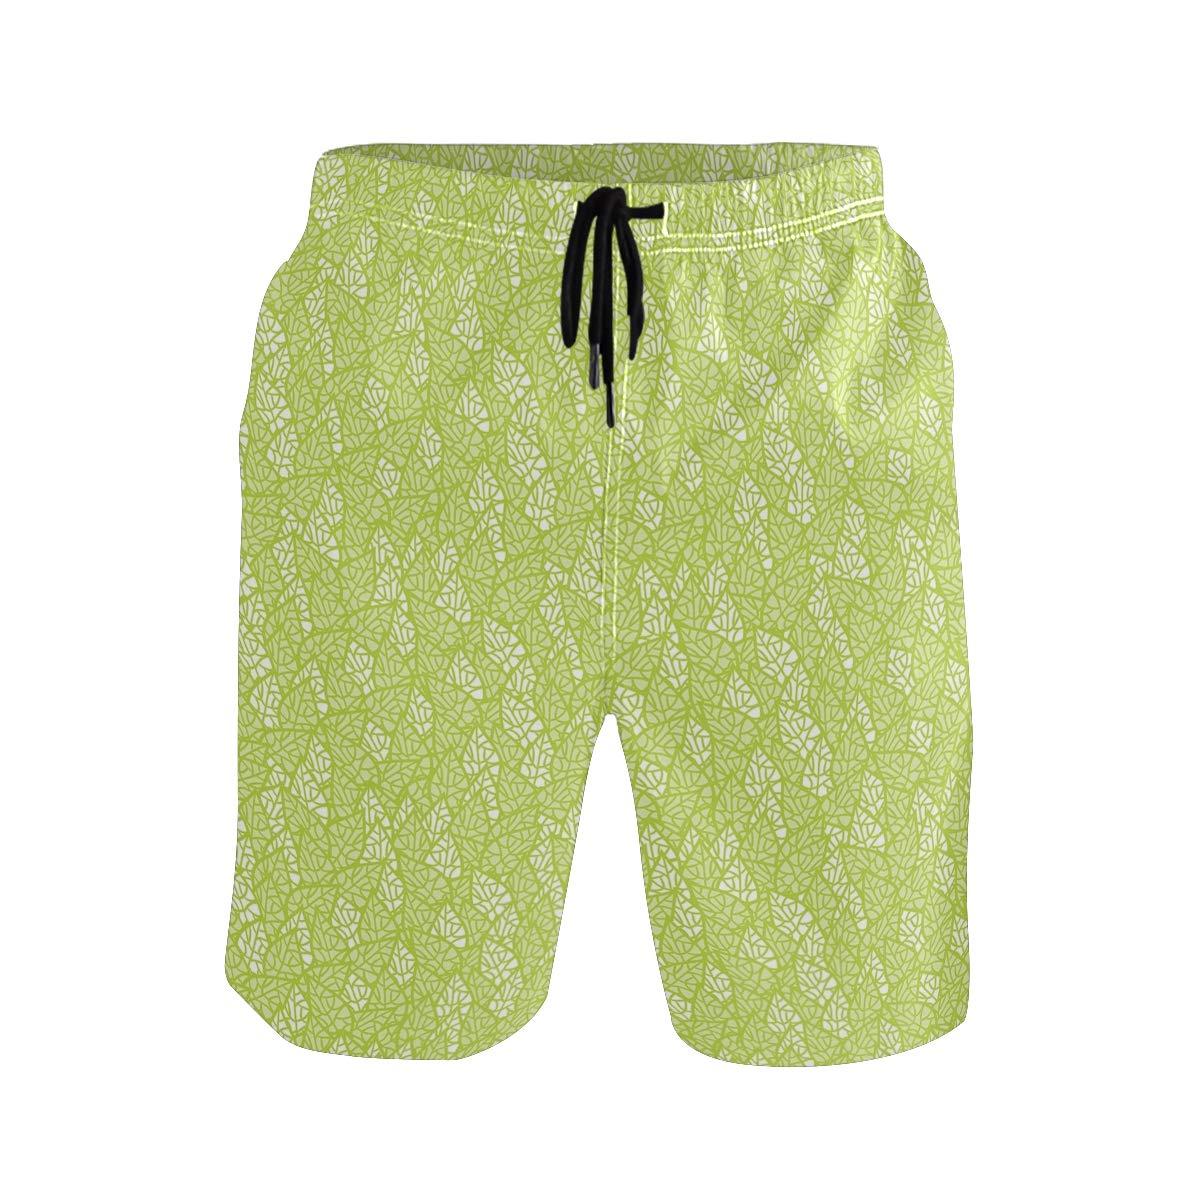 COVASA Mens Summer ShortsAbstract Style Simplistic Oval Shapes Repeating On Tu